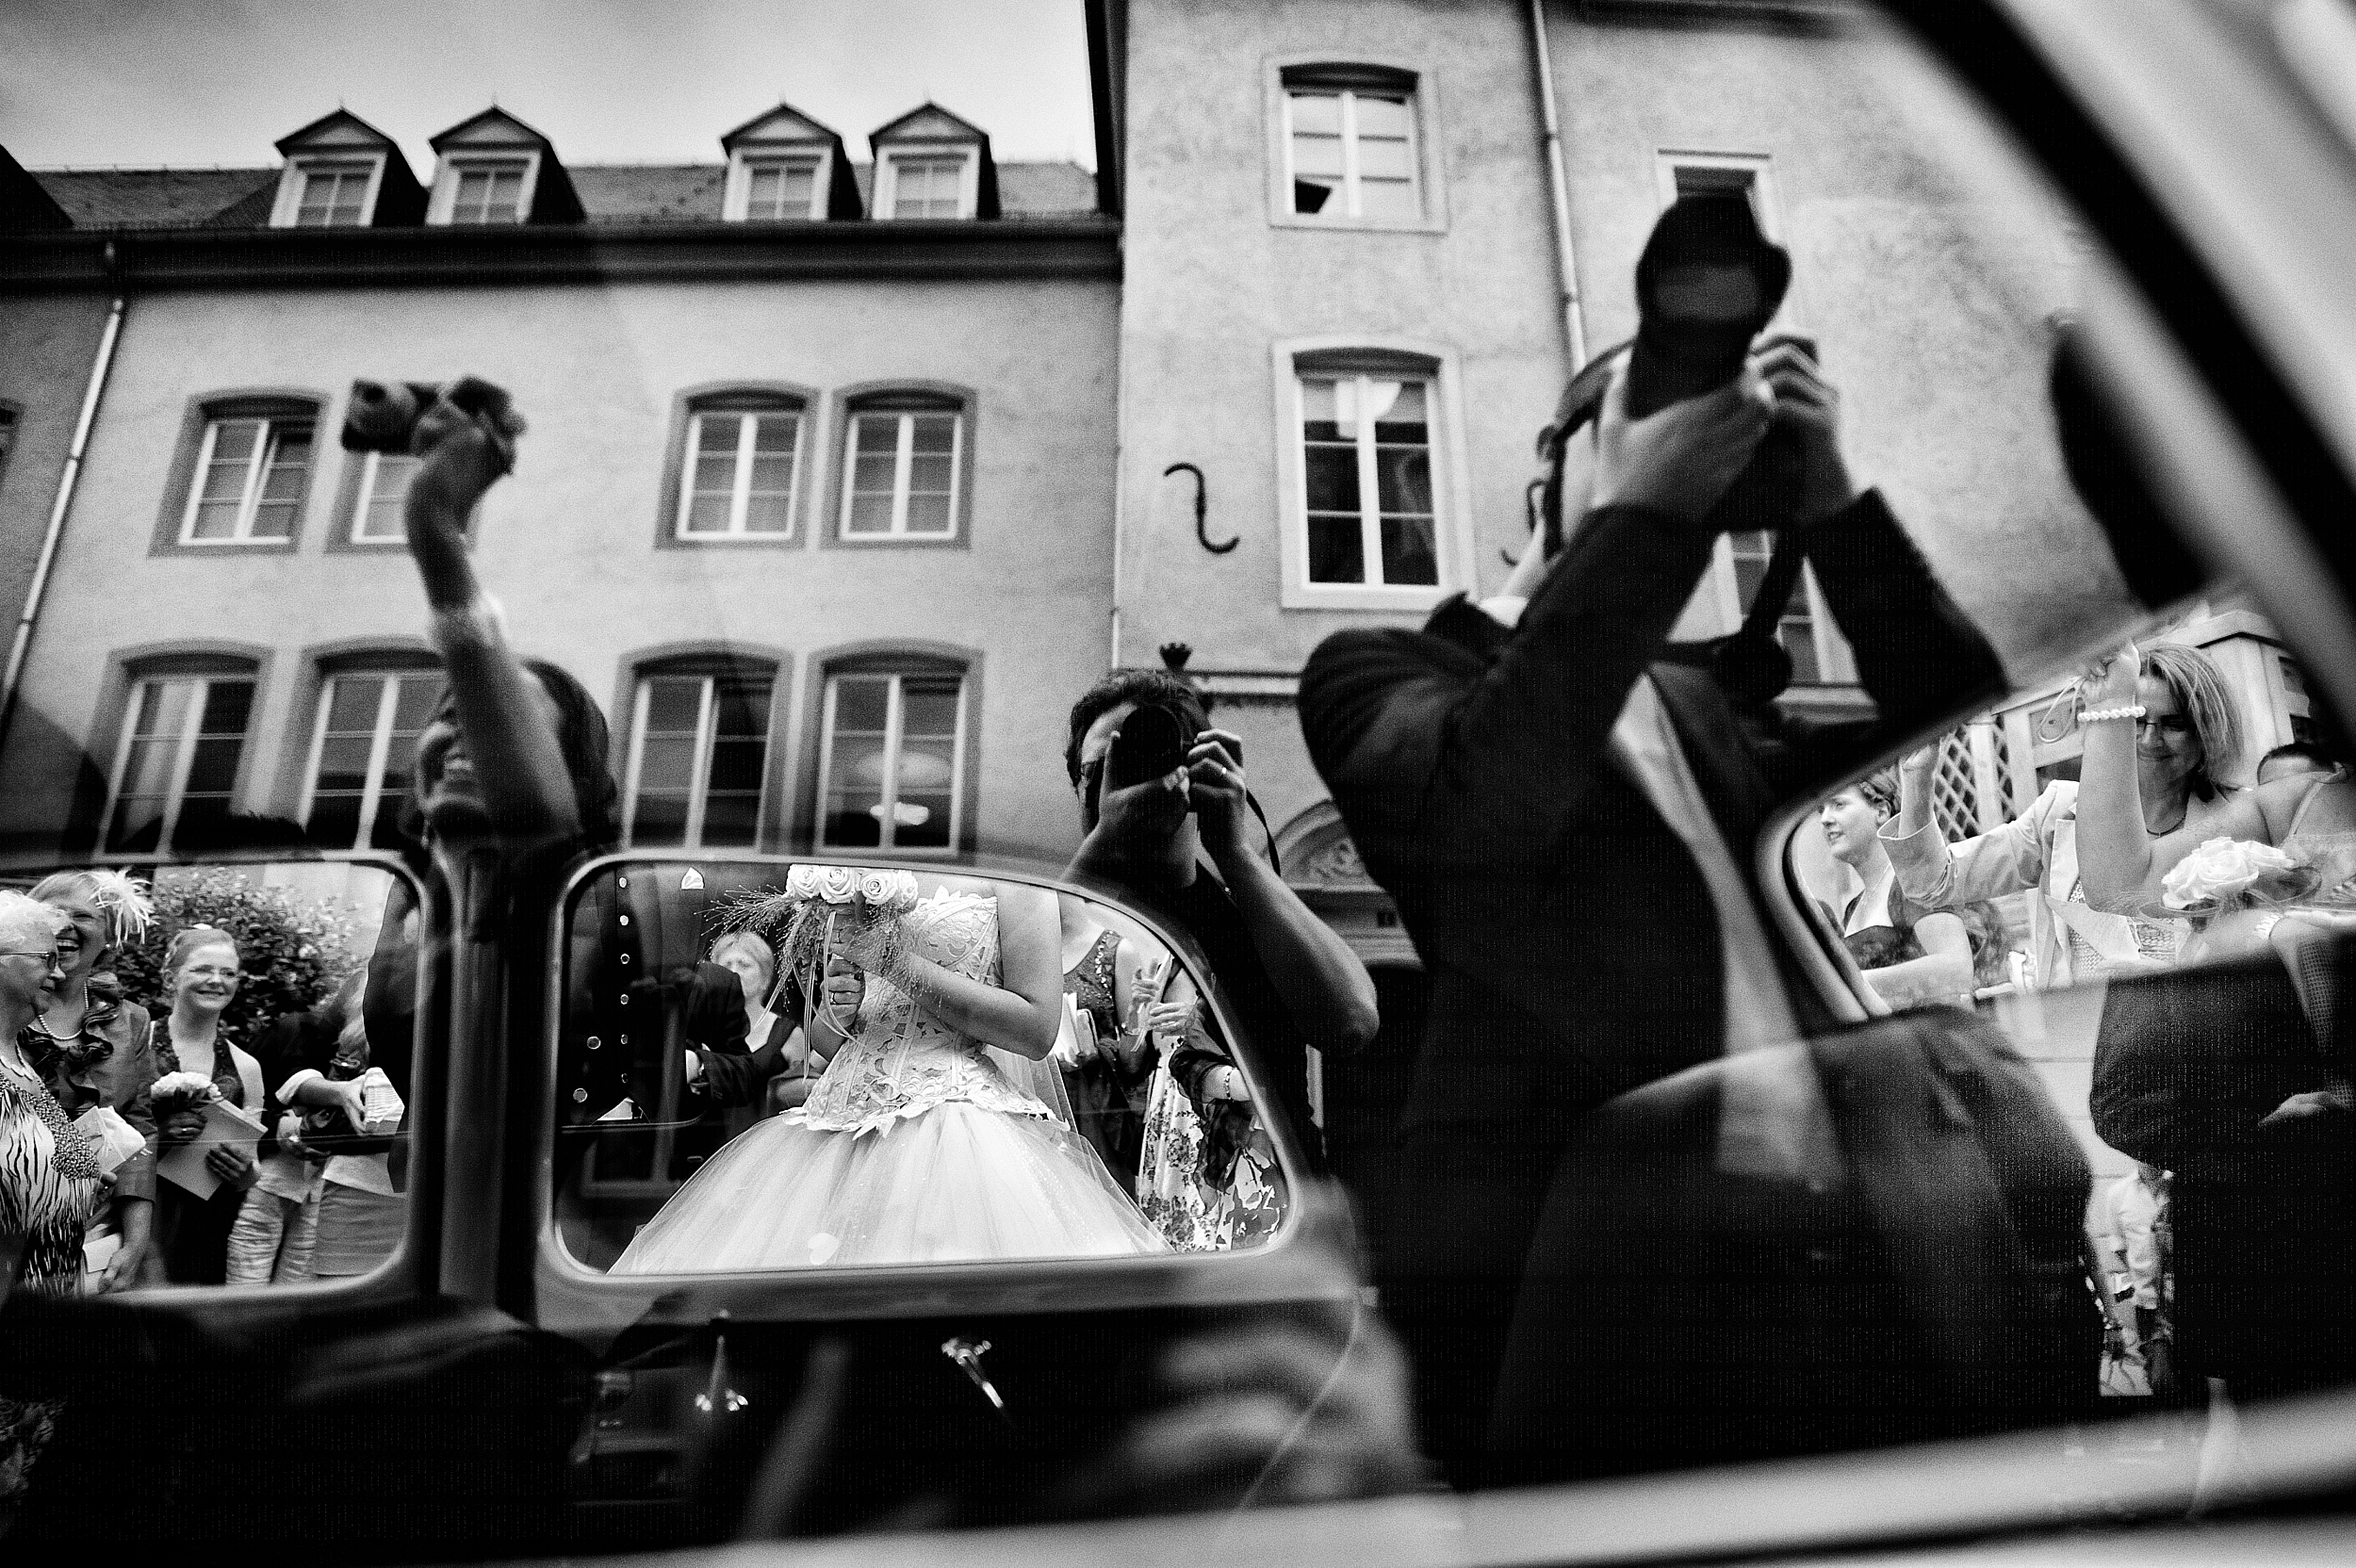 © Marco Schwarz